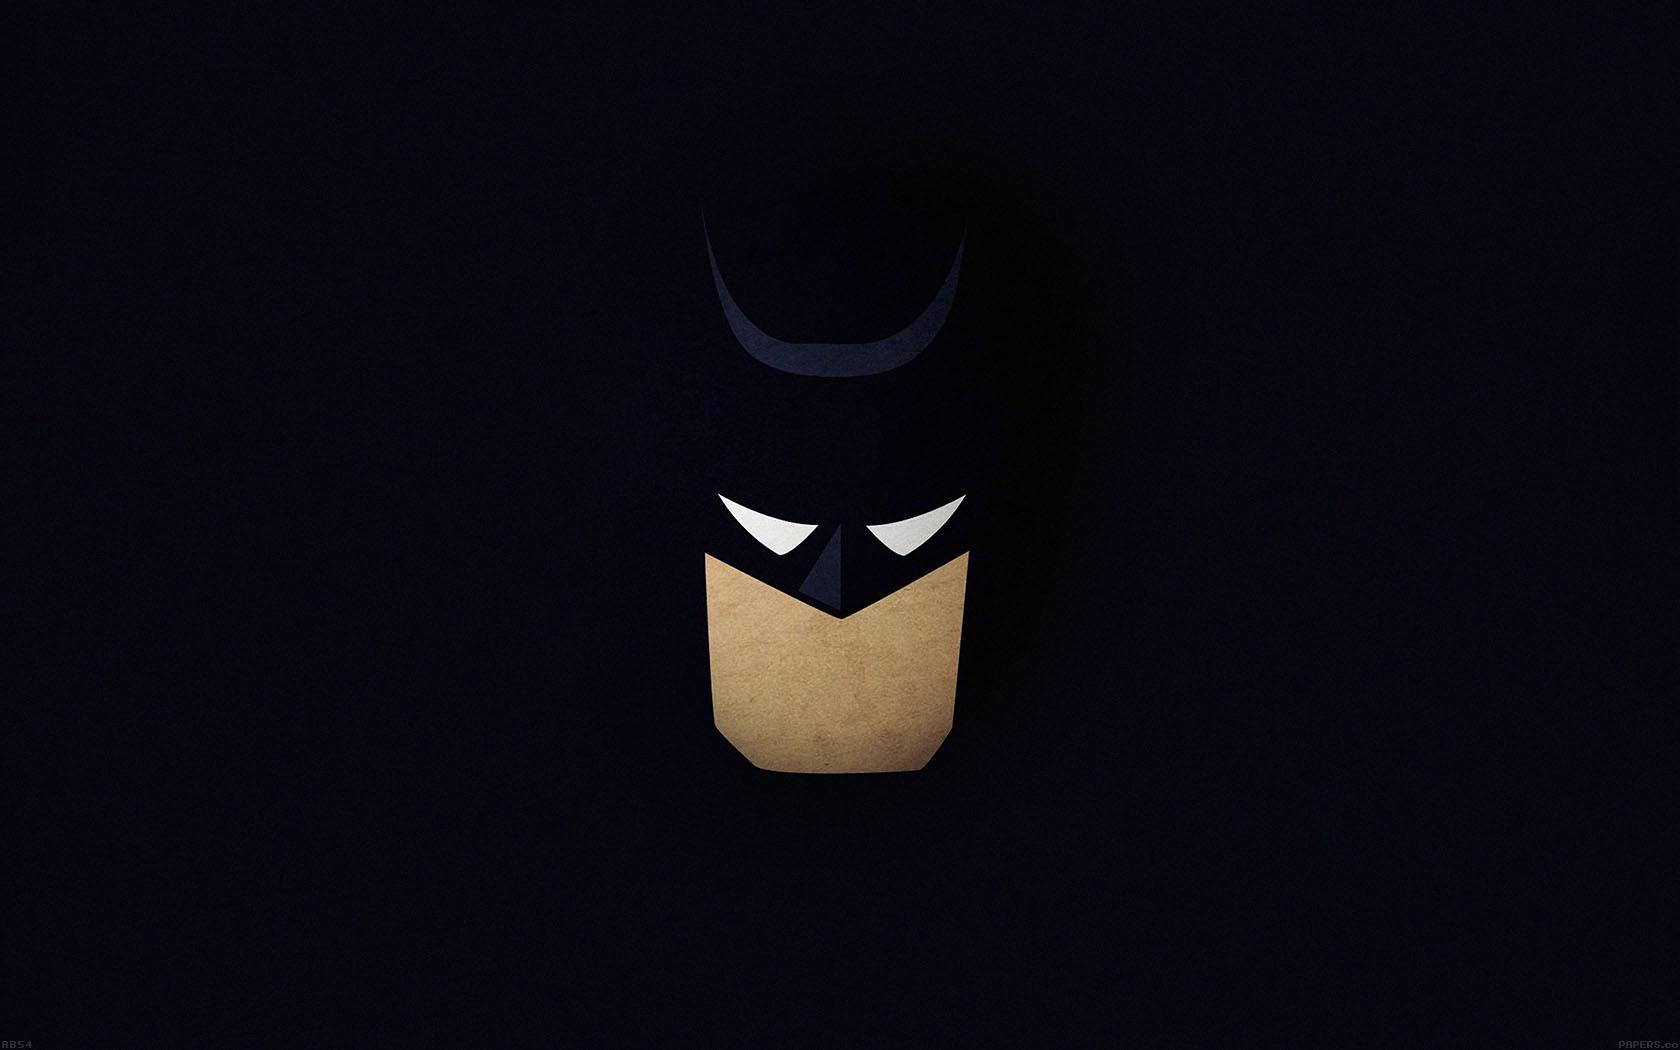 Iphone Fall Wallpaper Ab54 Wallpaper Batman Face Dark Minimal Papers Co